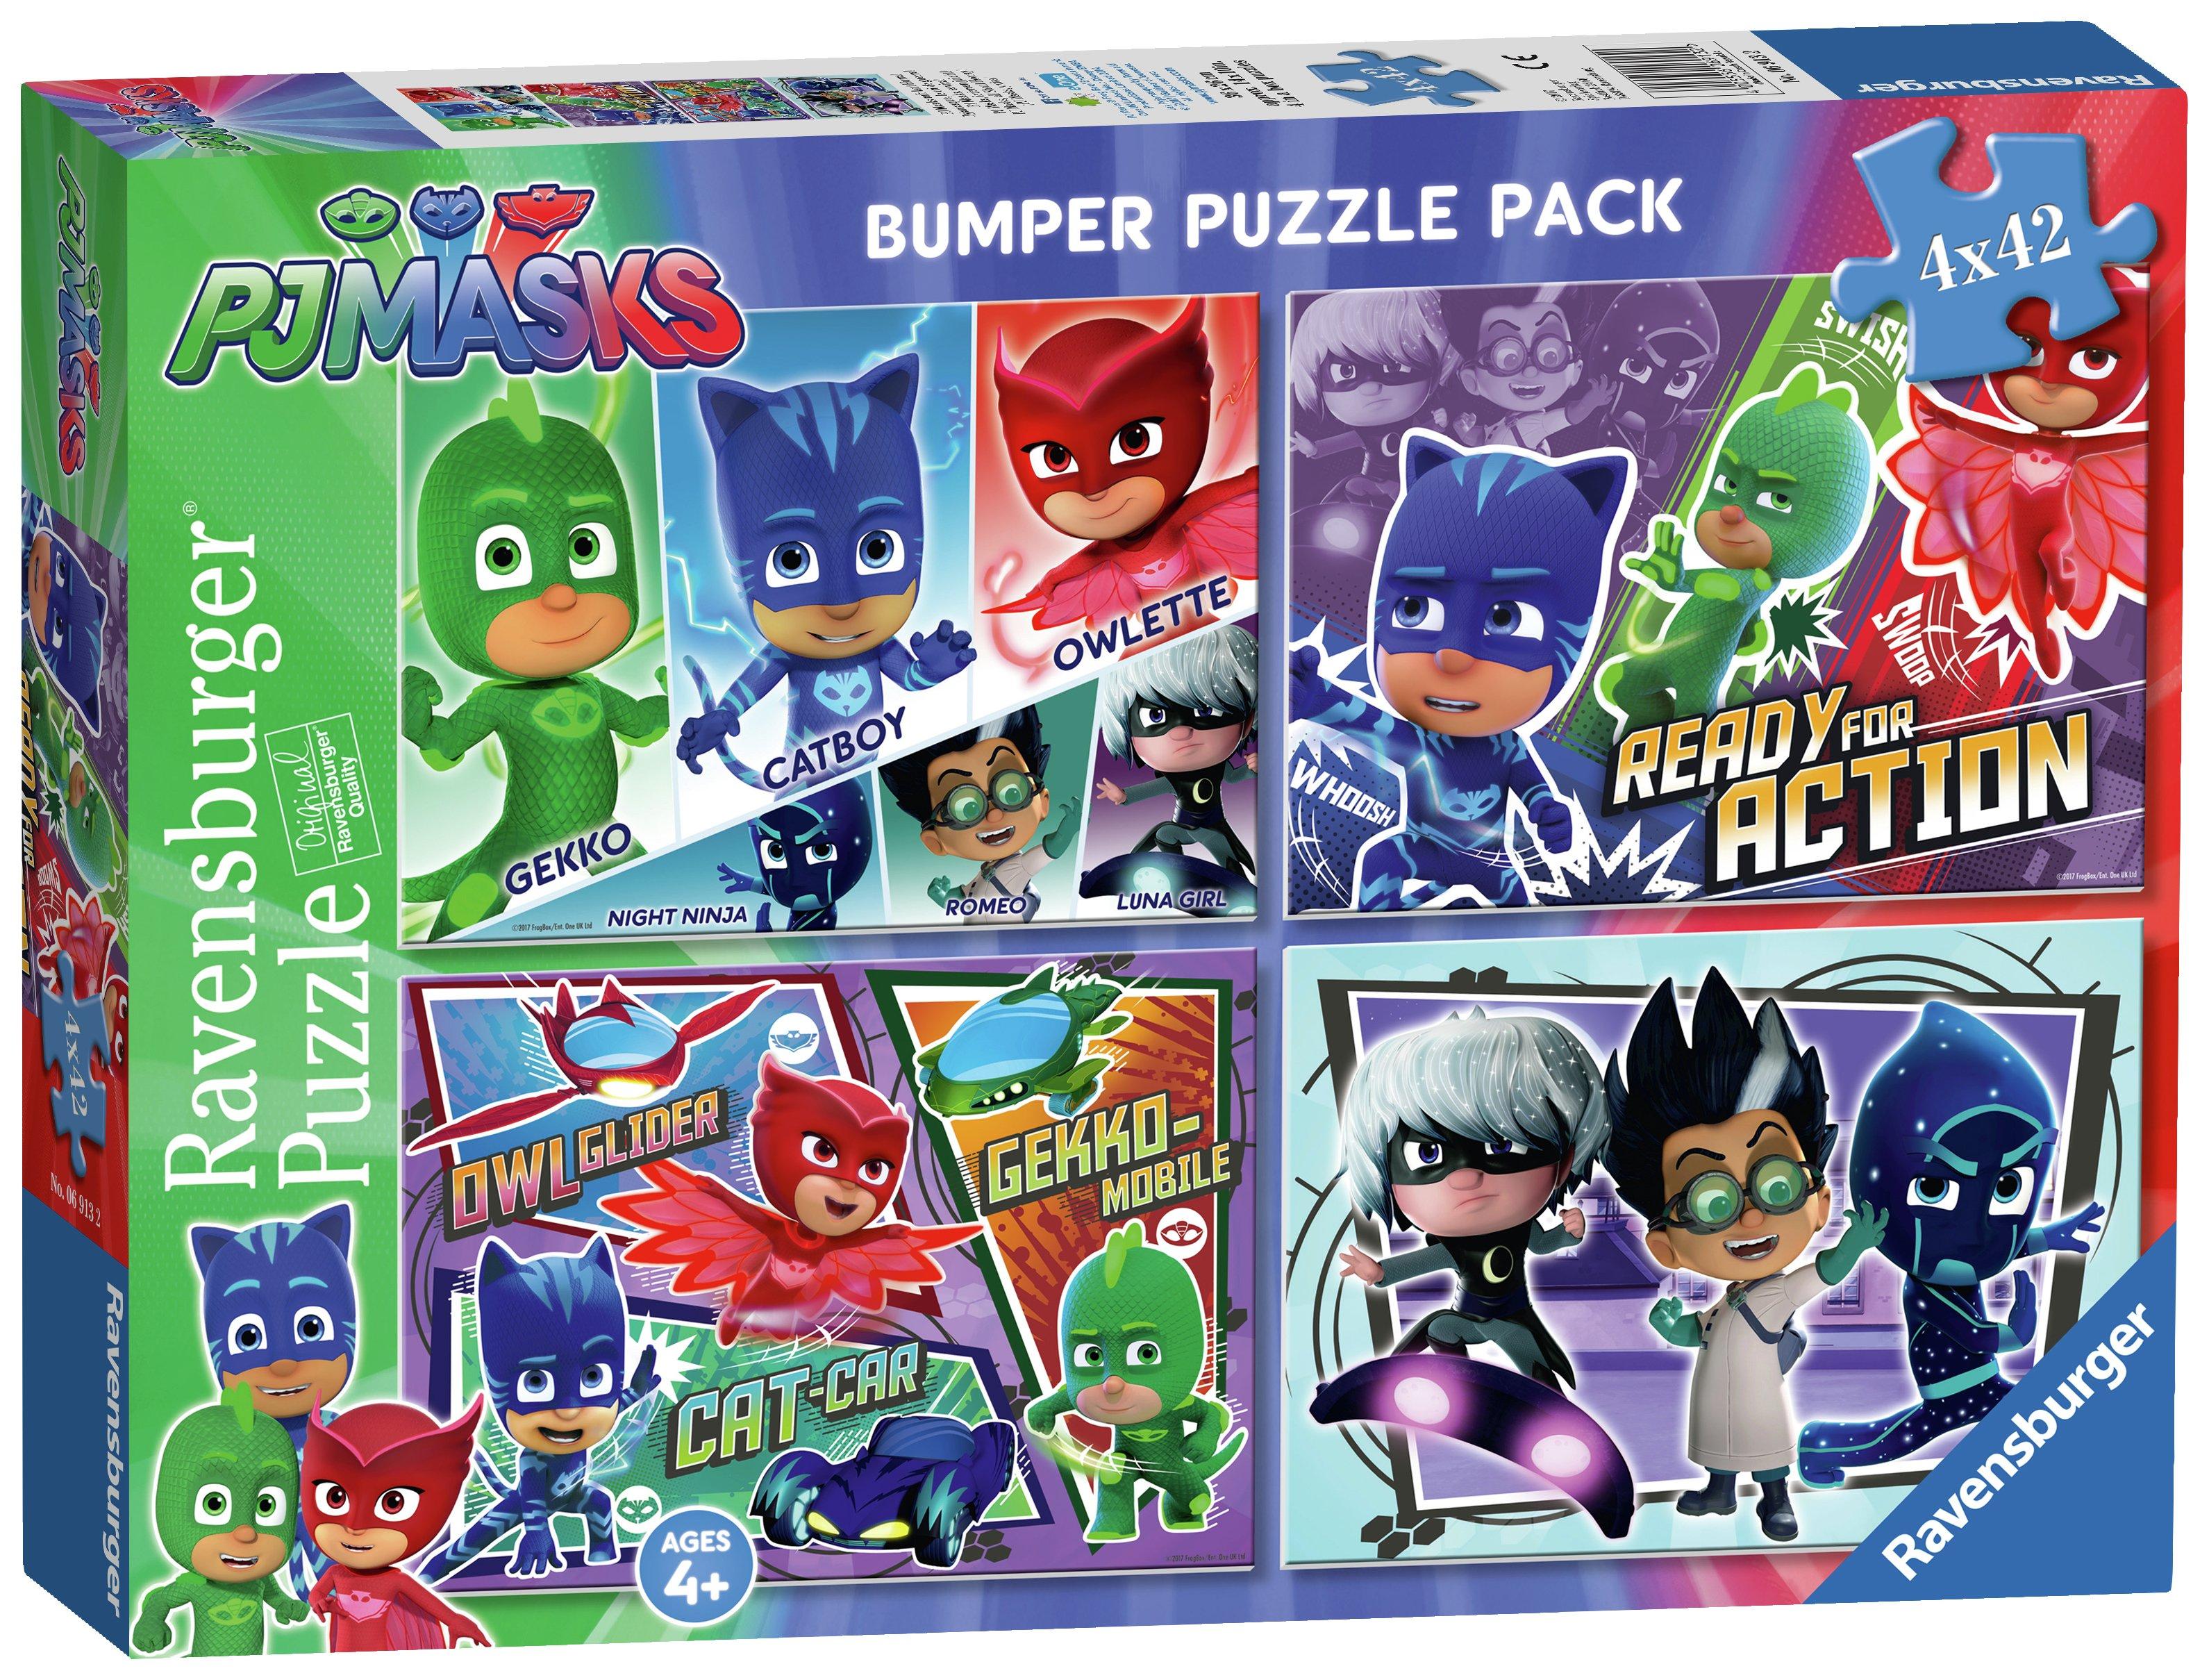 PJ Masks 42 Piece Jigsaw Puzzle - 4 Pack.